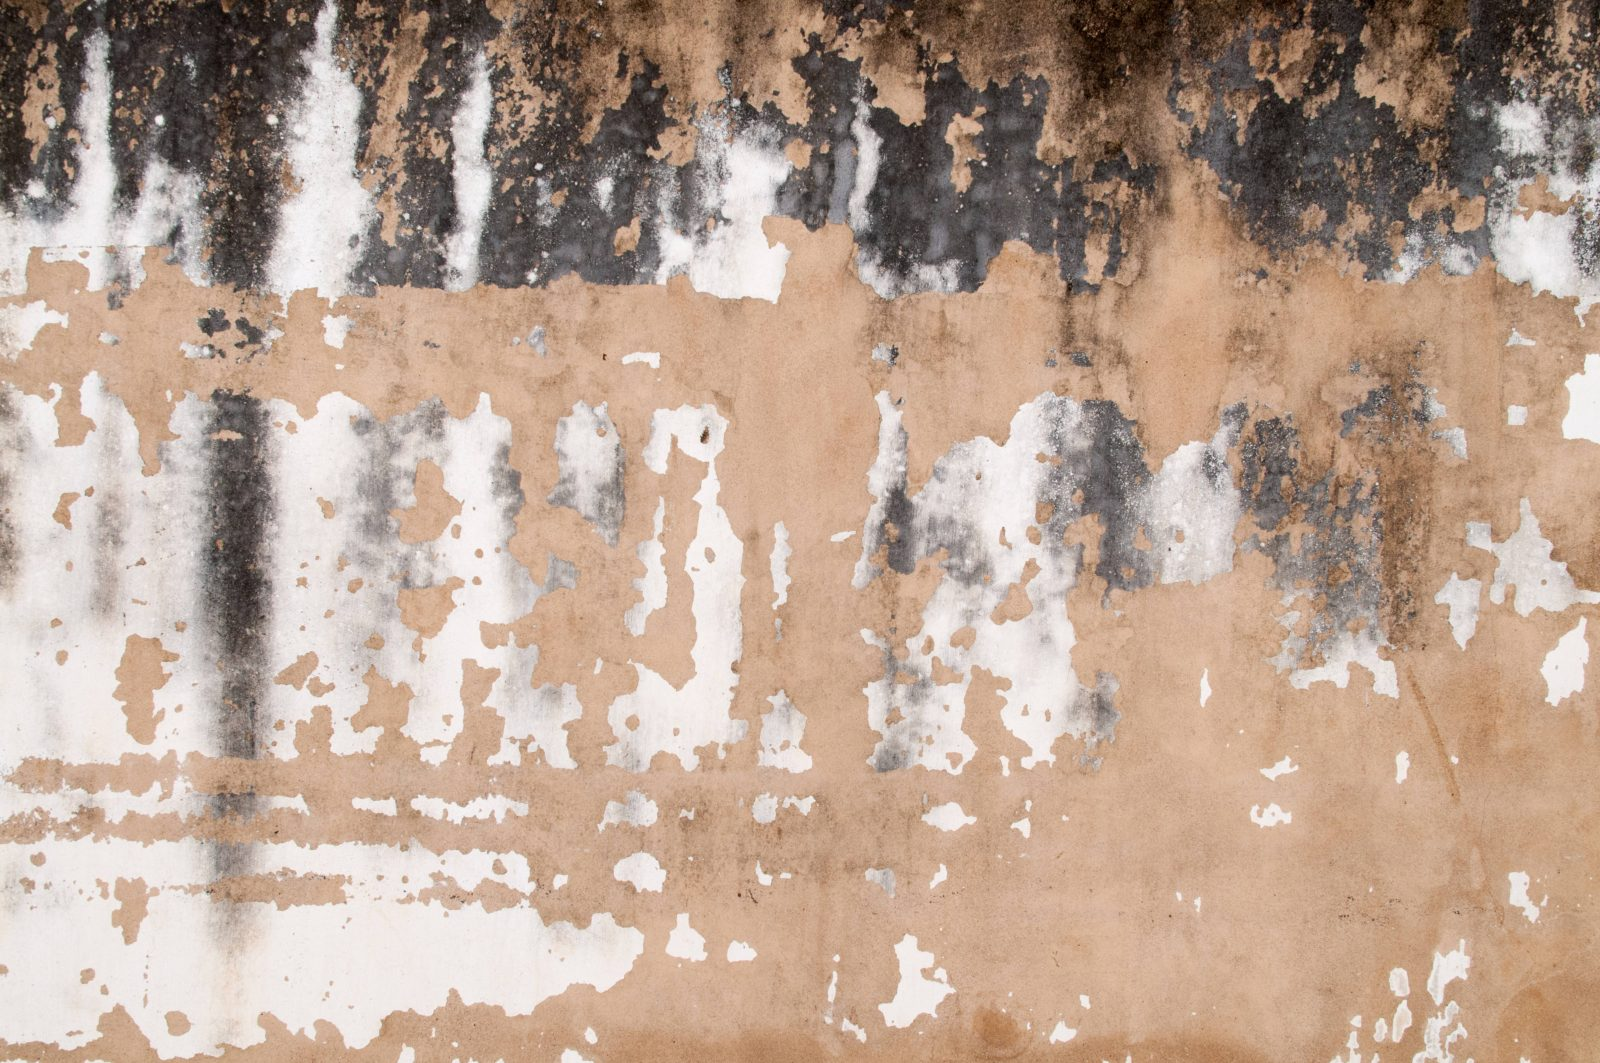 Concrete Grunge Wall